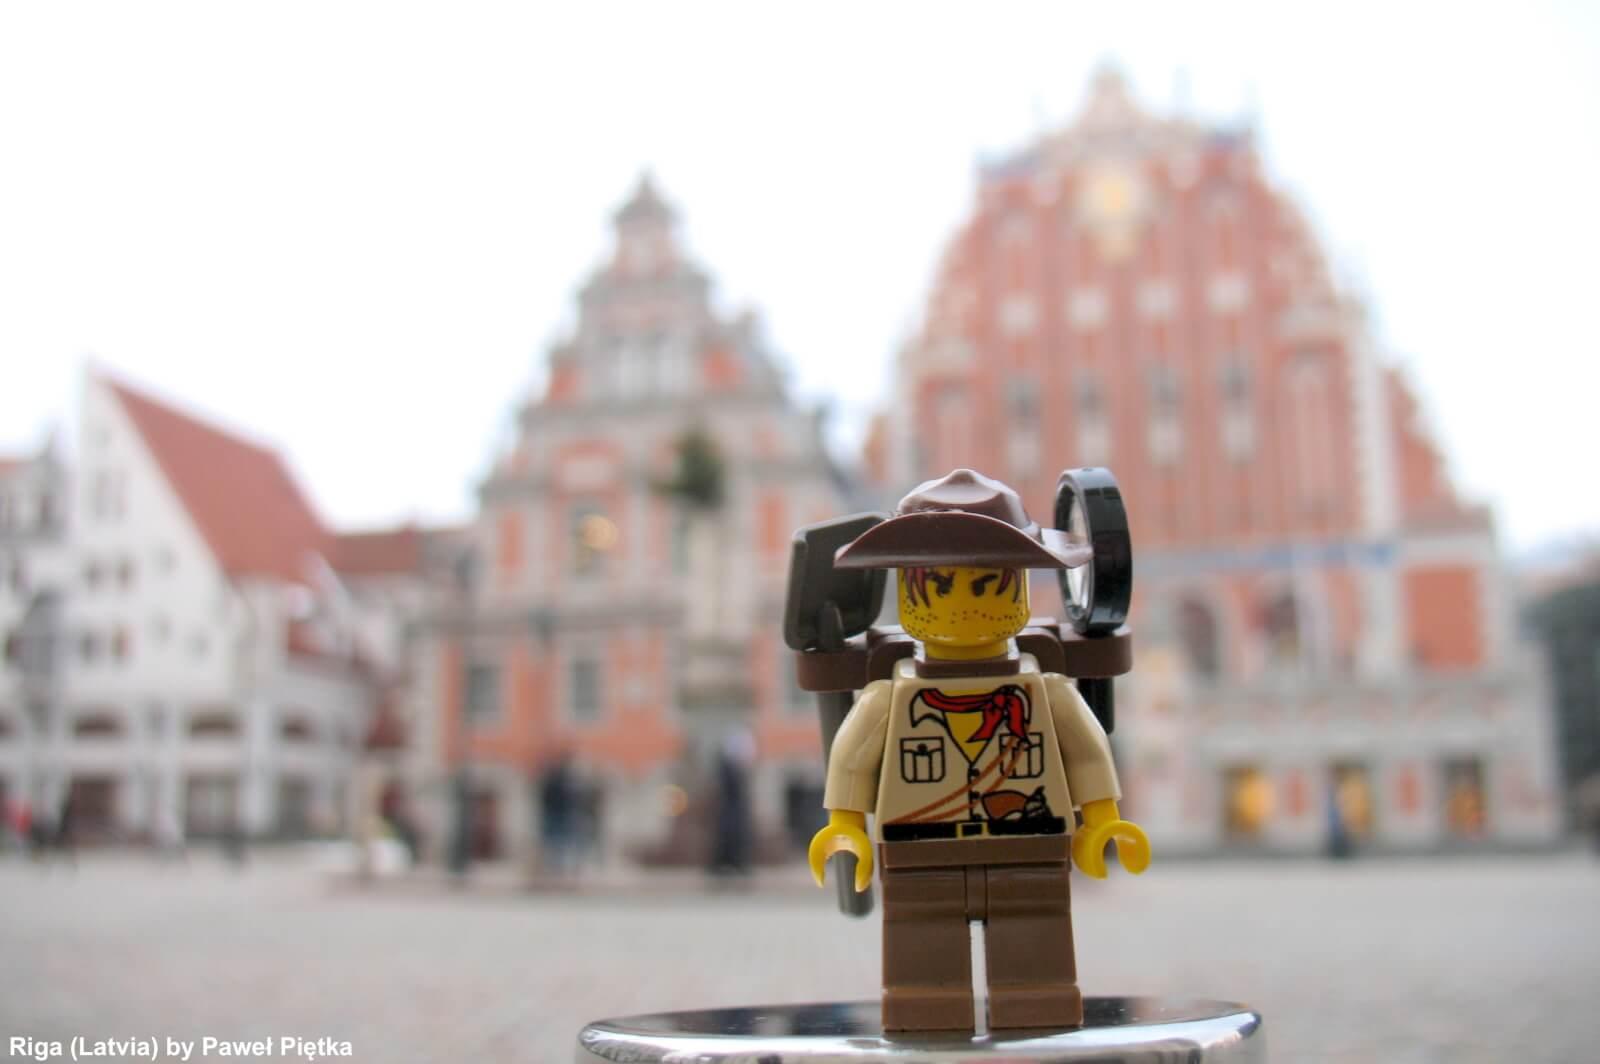 Riga (Latvia) - House of the Blackheads